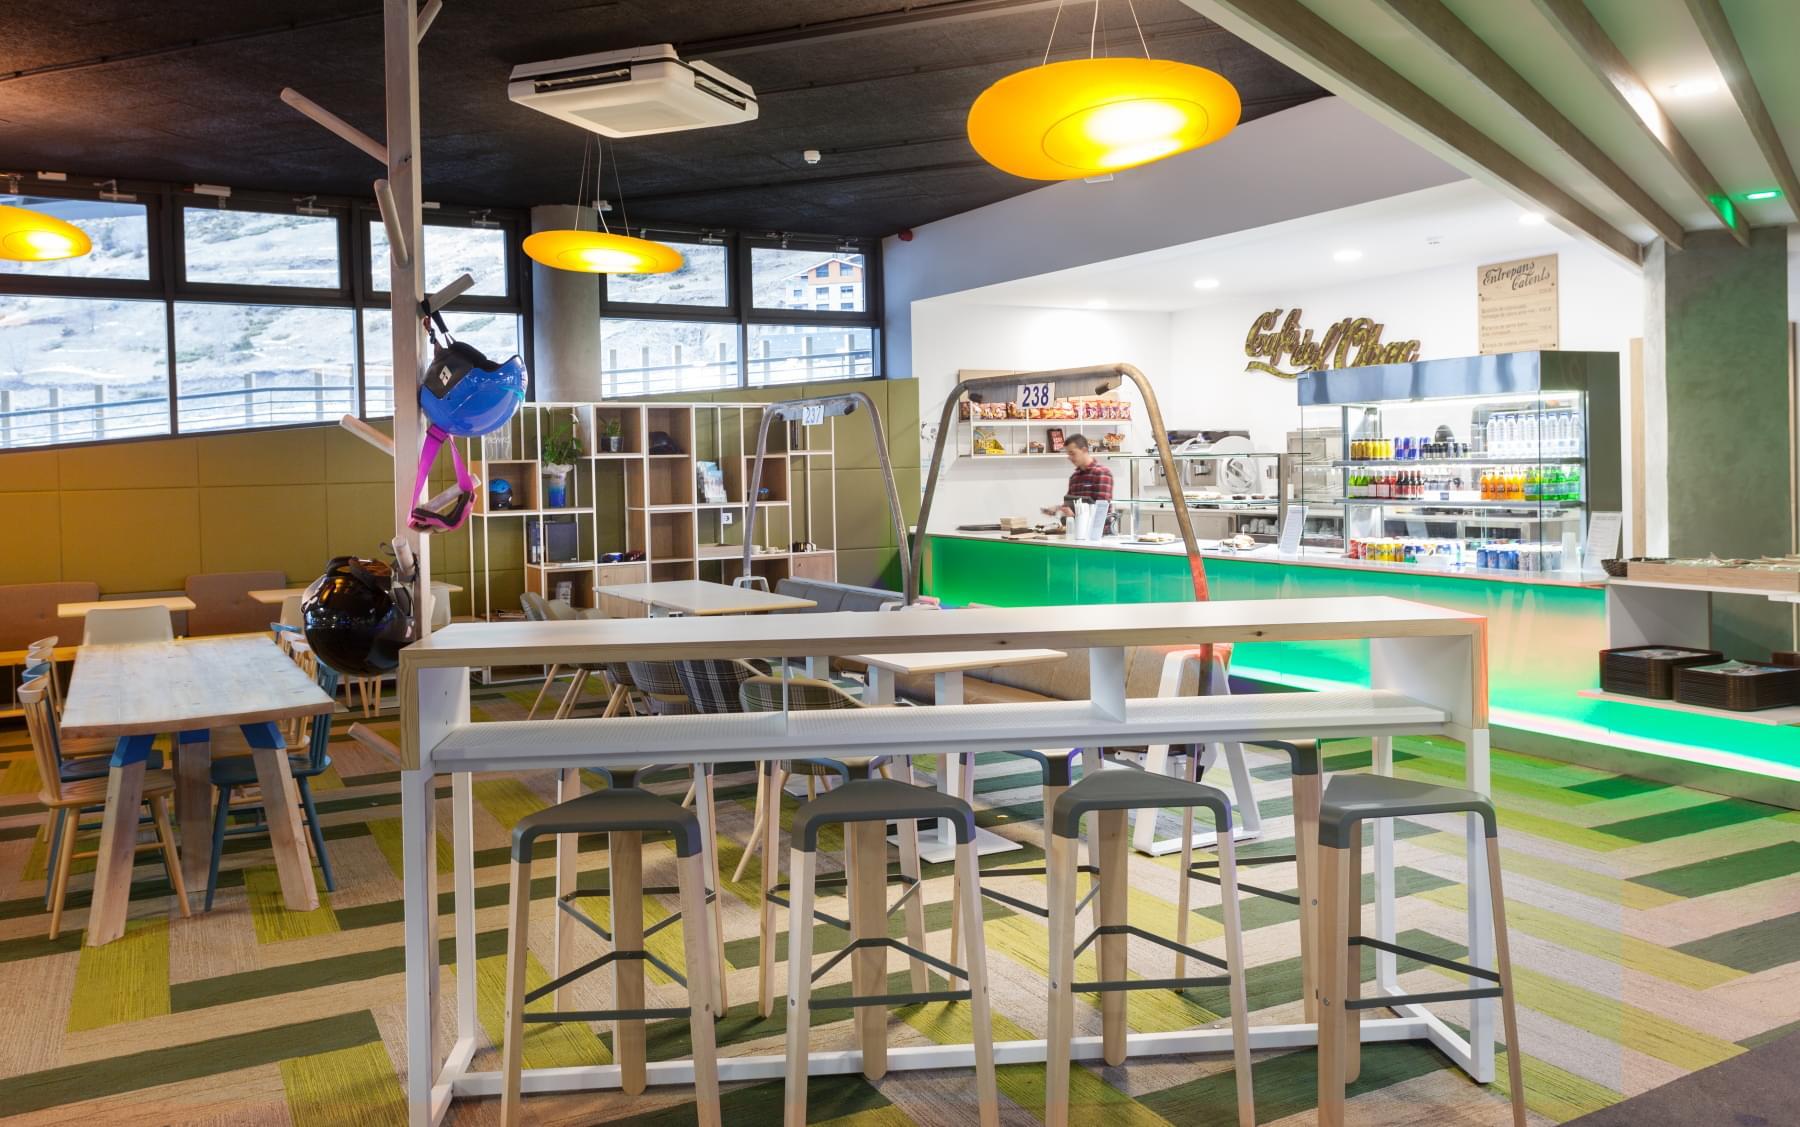 CAFETERIA EL TARTER GRANDVALIRA ANDORRA - CAFE DE L'OBAC by ROSA COLET